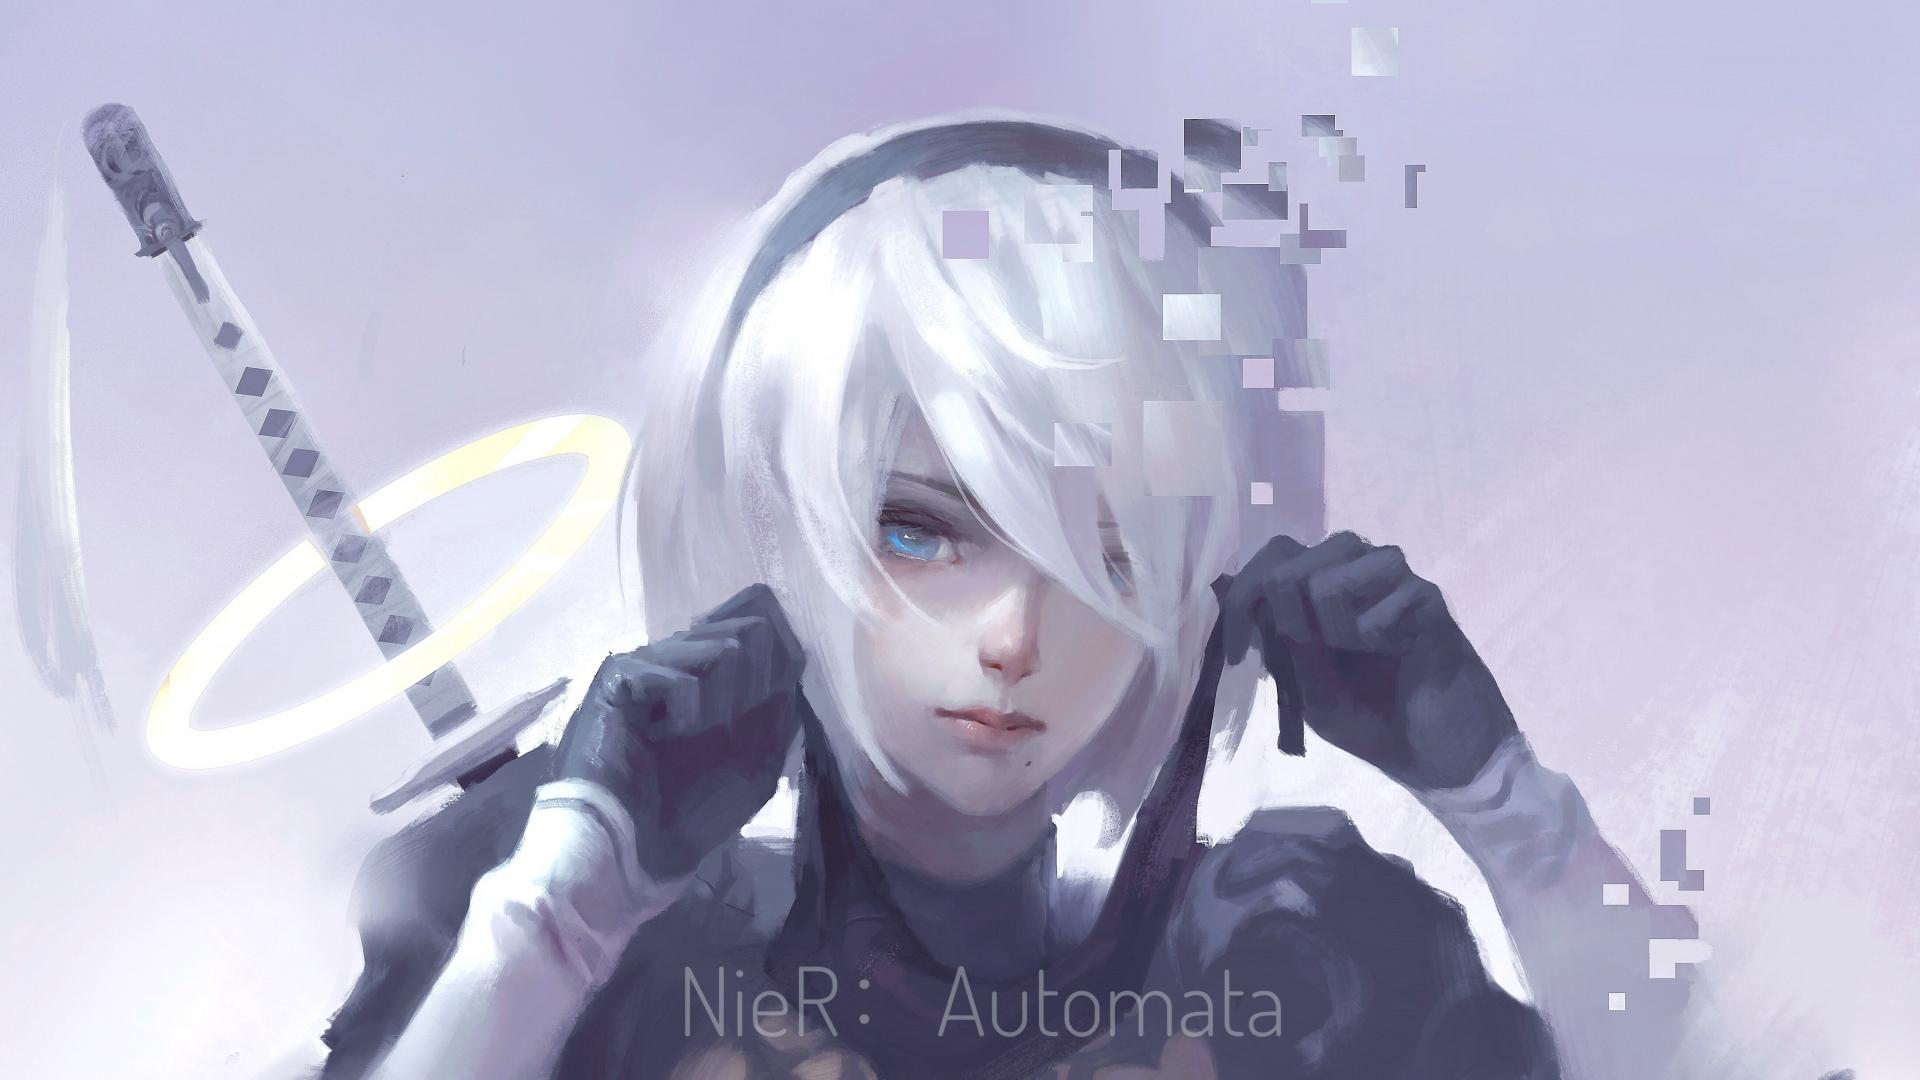 Download 1920x1080 Wallpaper Nier Automata White Hair B2